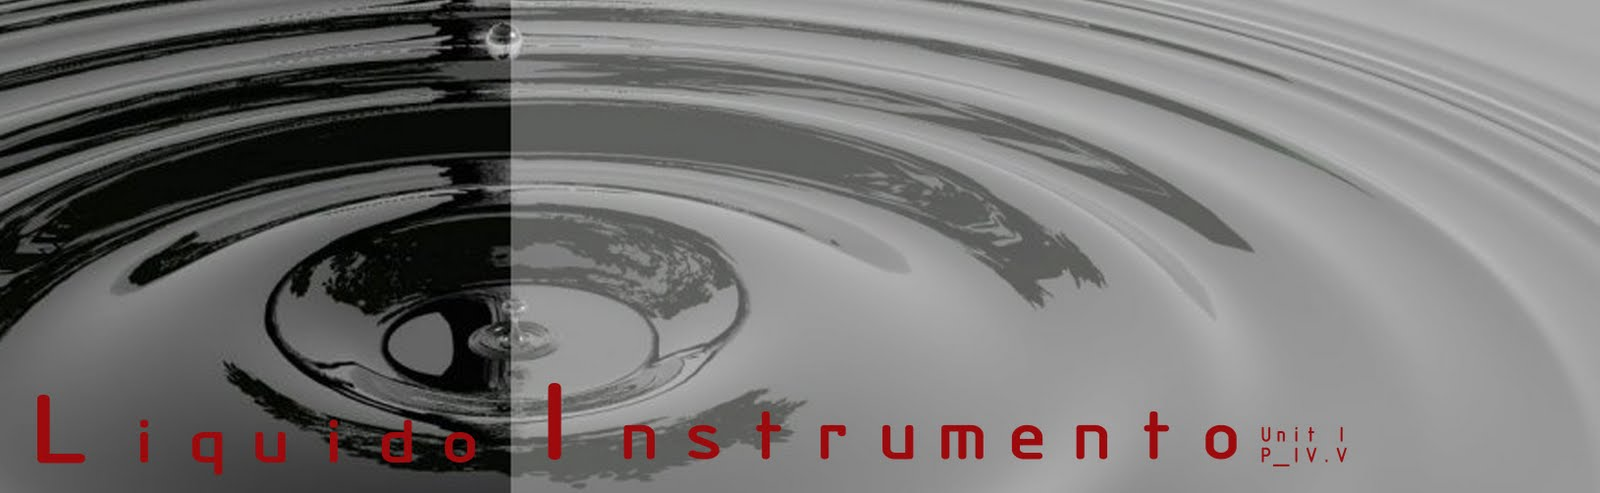 Liquido Instrumento